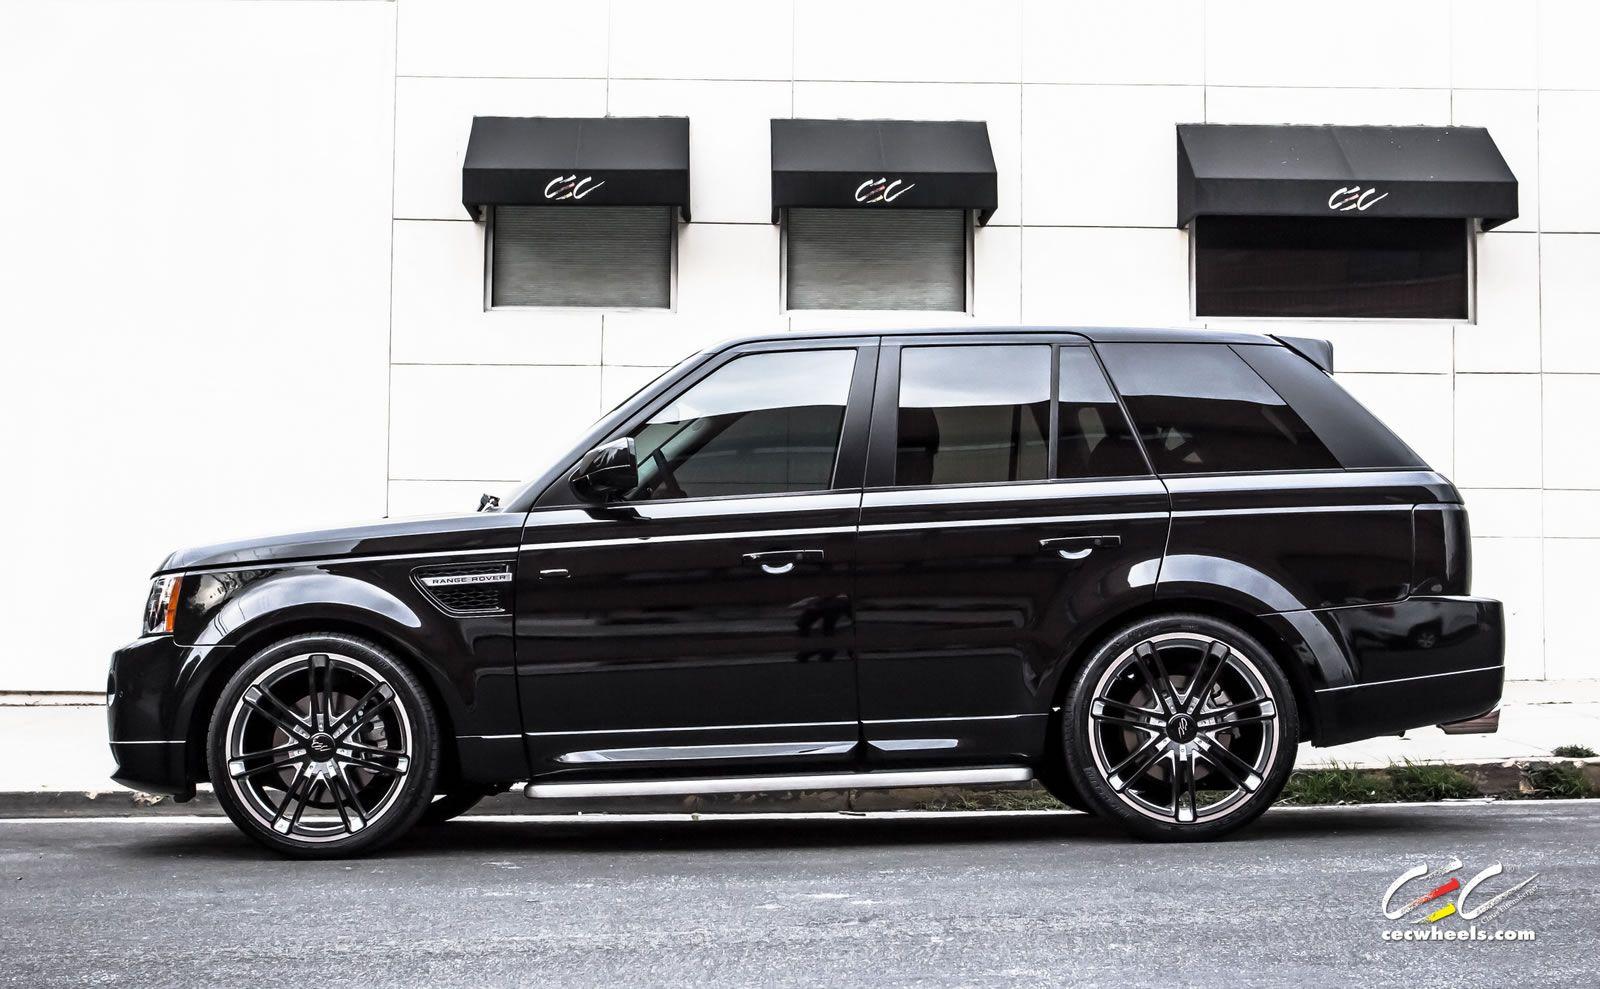 suv rims This black on black 2013 Range Rover Sport was